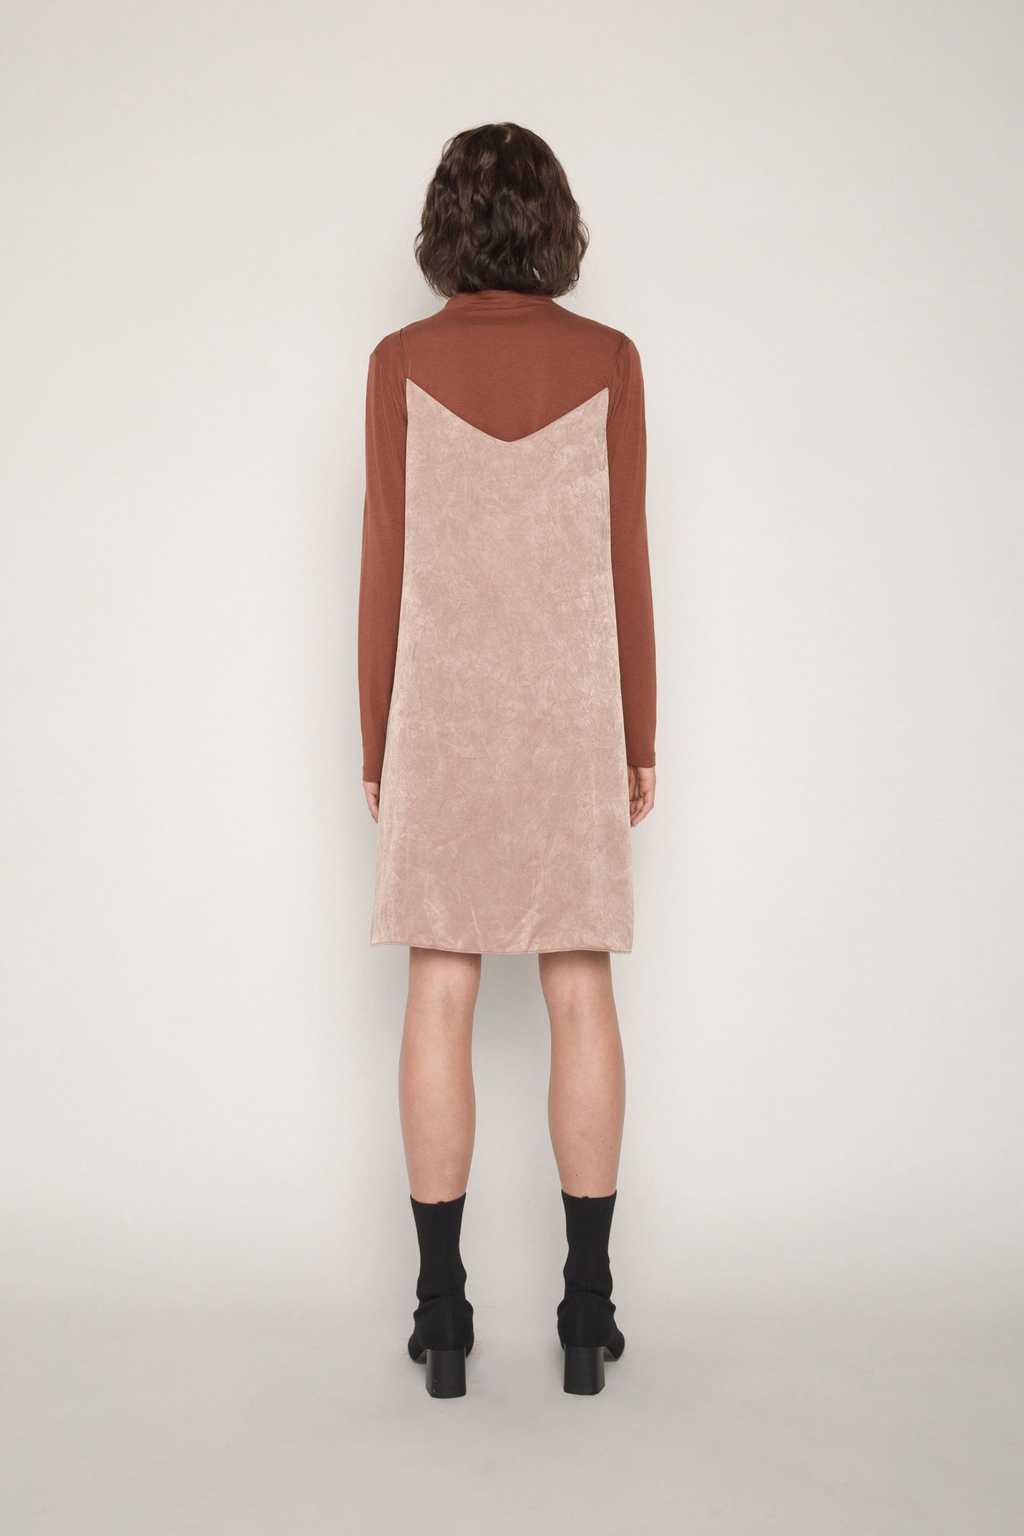 Dress H233 Beige 4